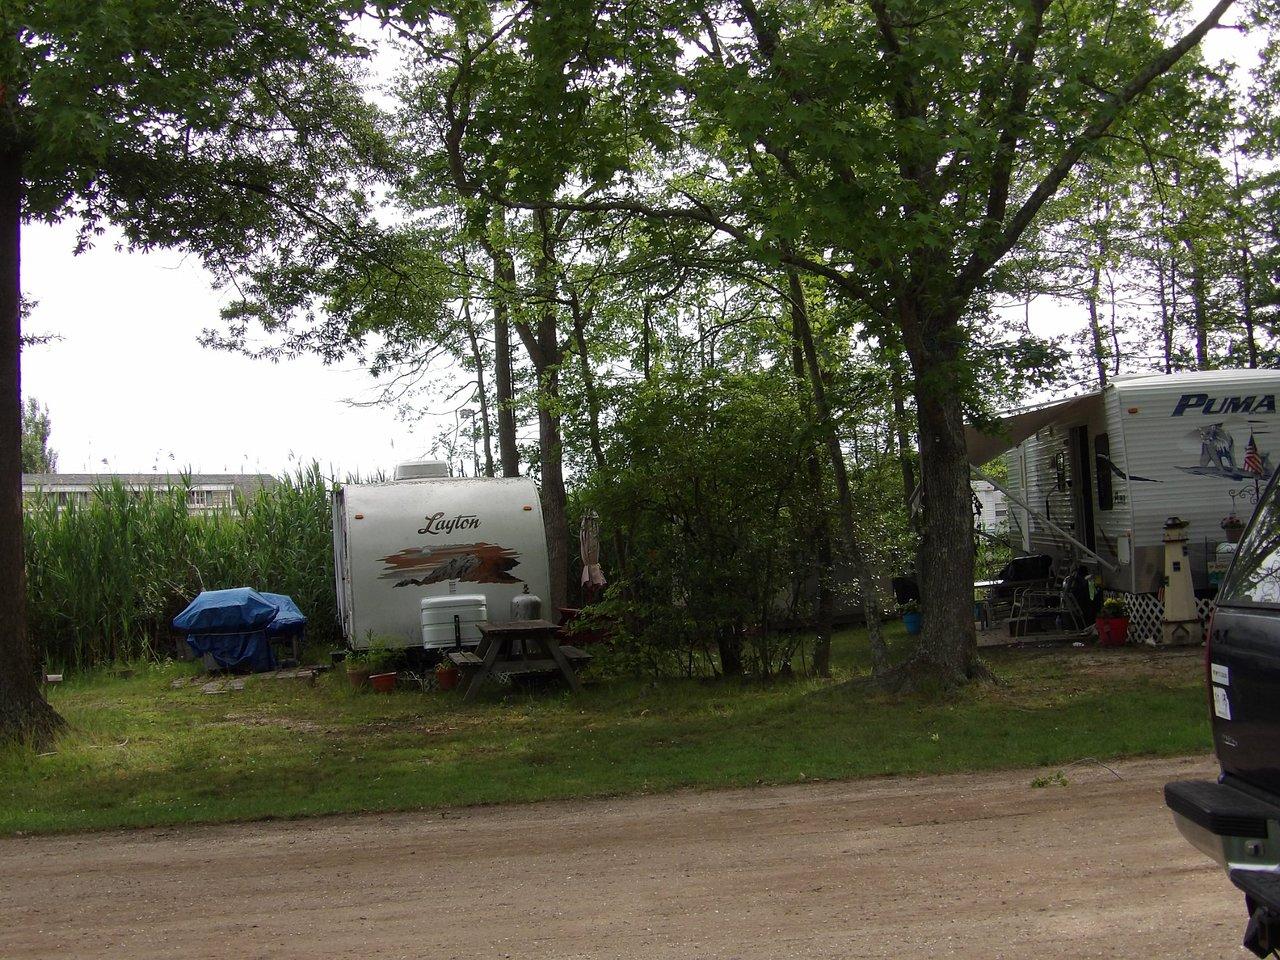 king nummy trail campground reviews cape may court house nj rh tripadvisor com